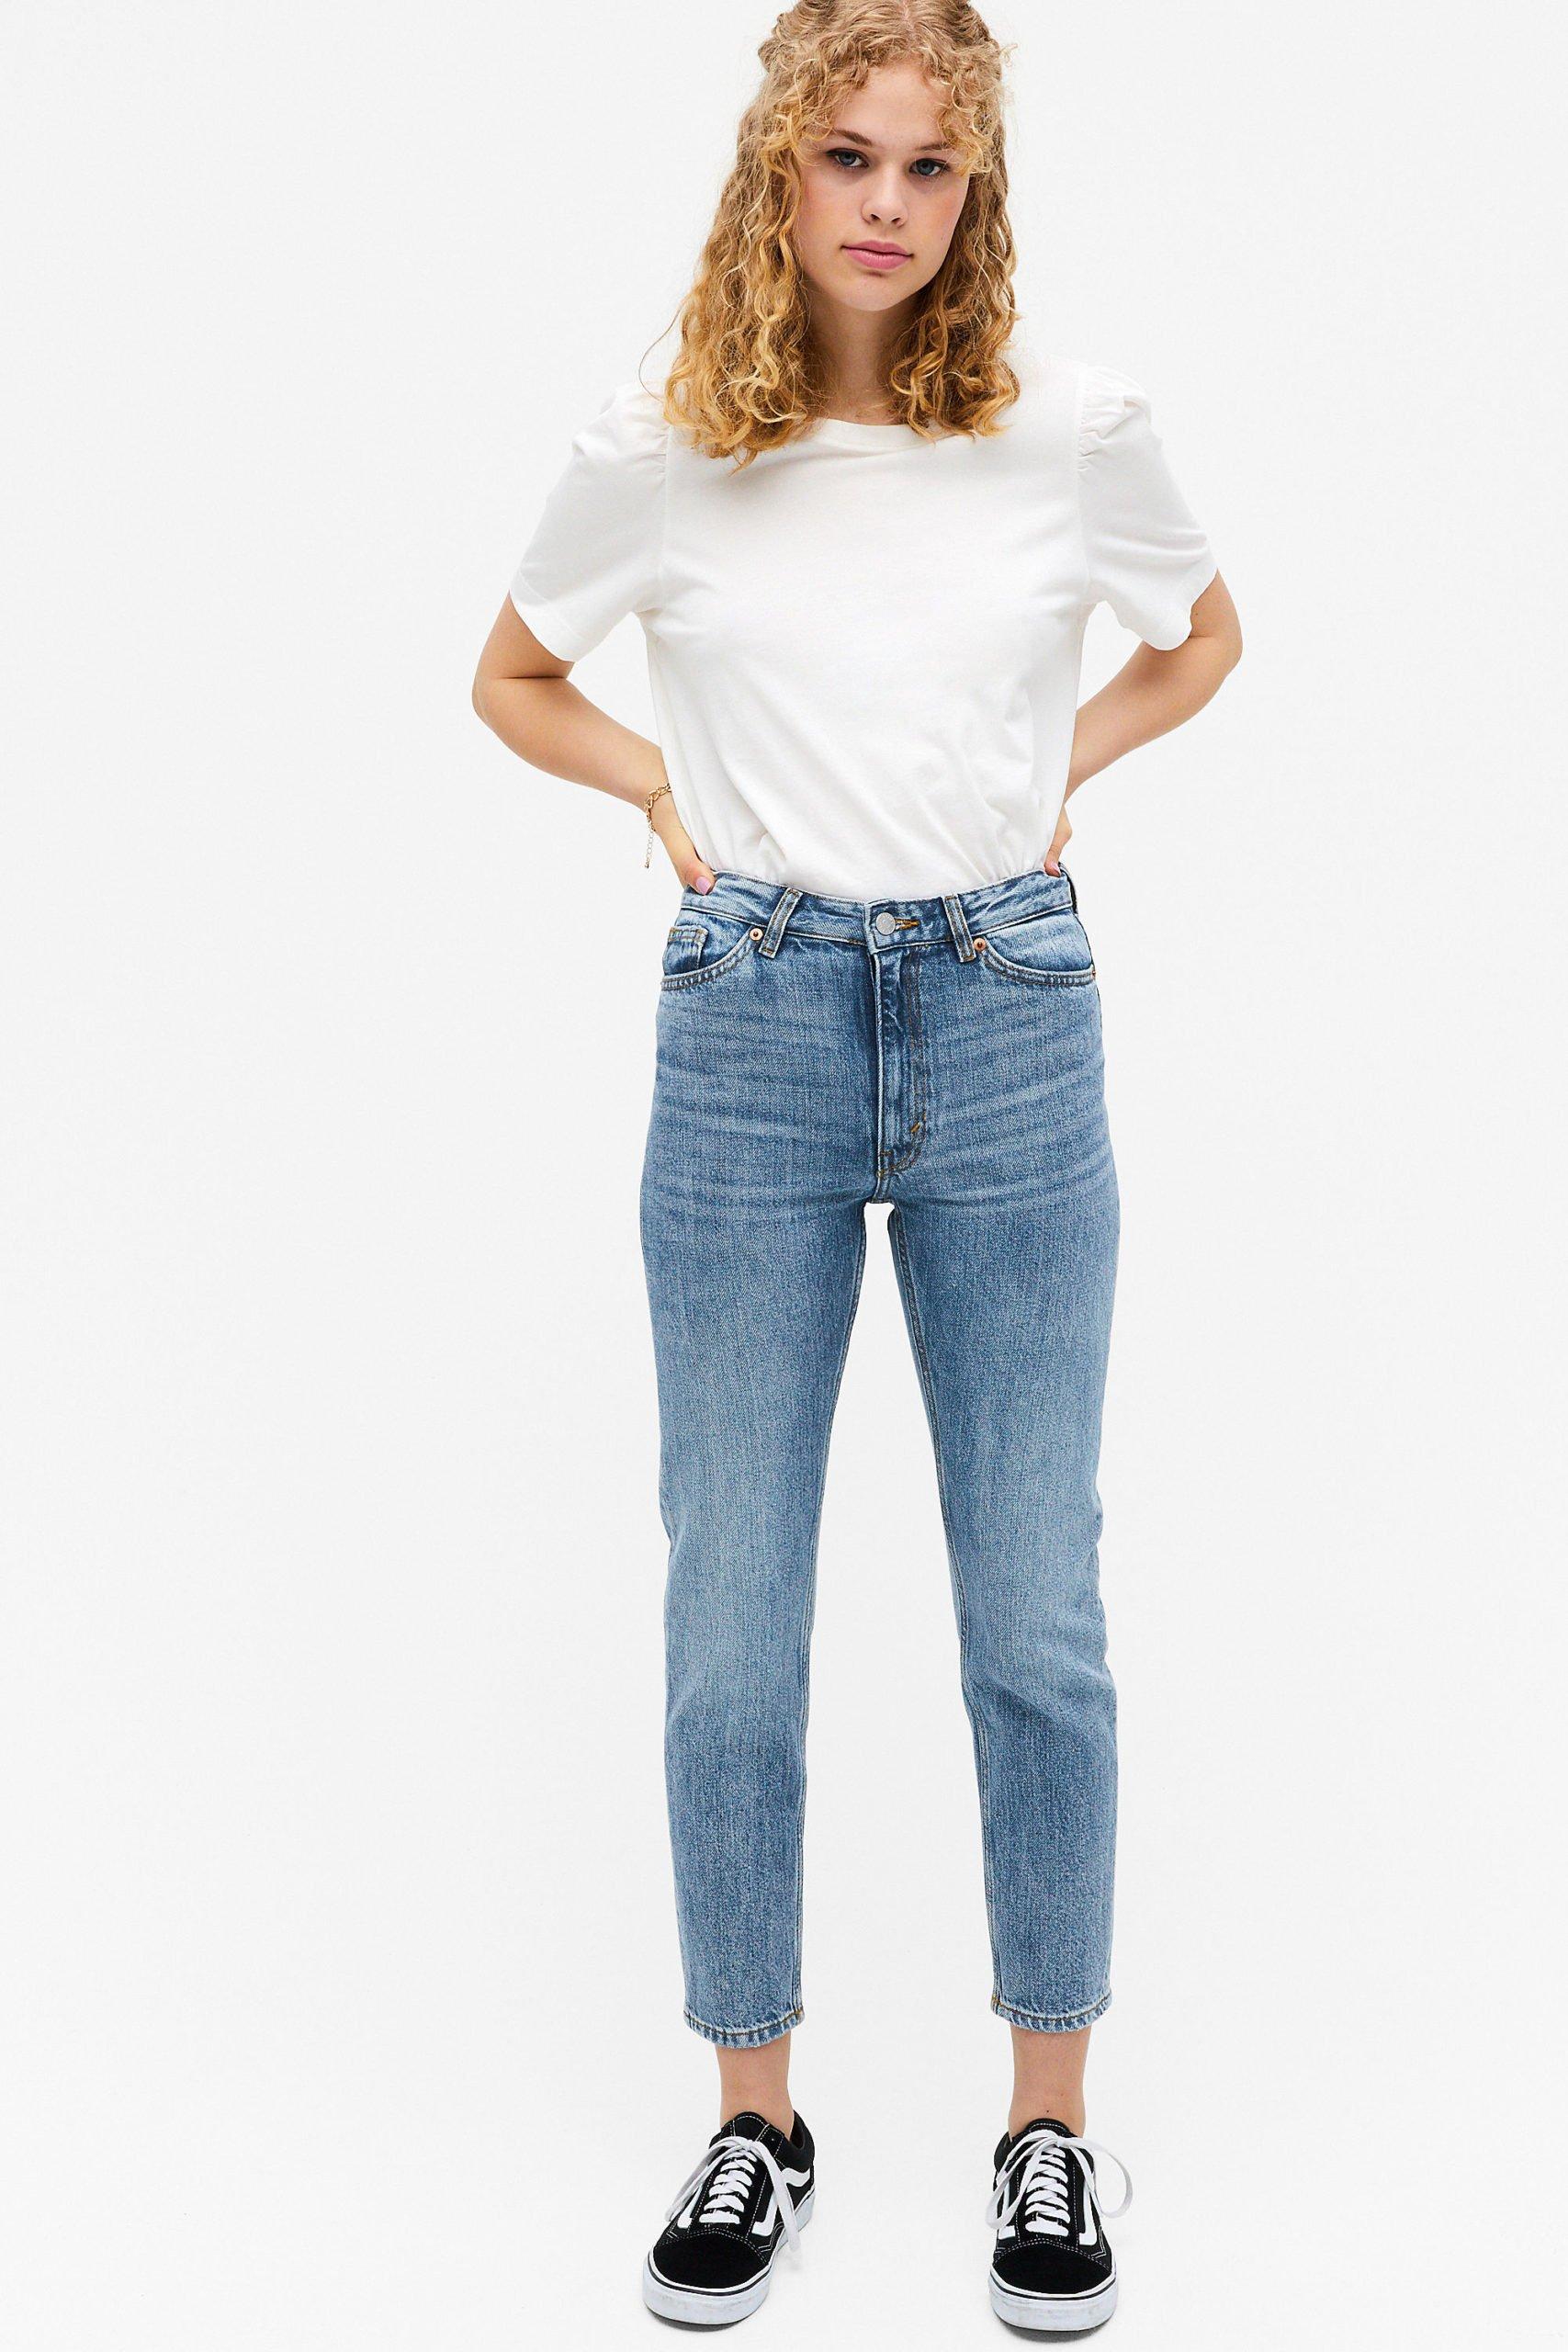 a la recherche du jean eco responsable / withalovelikethat.fr